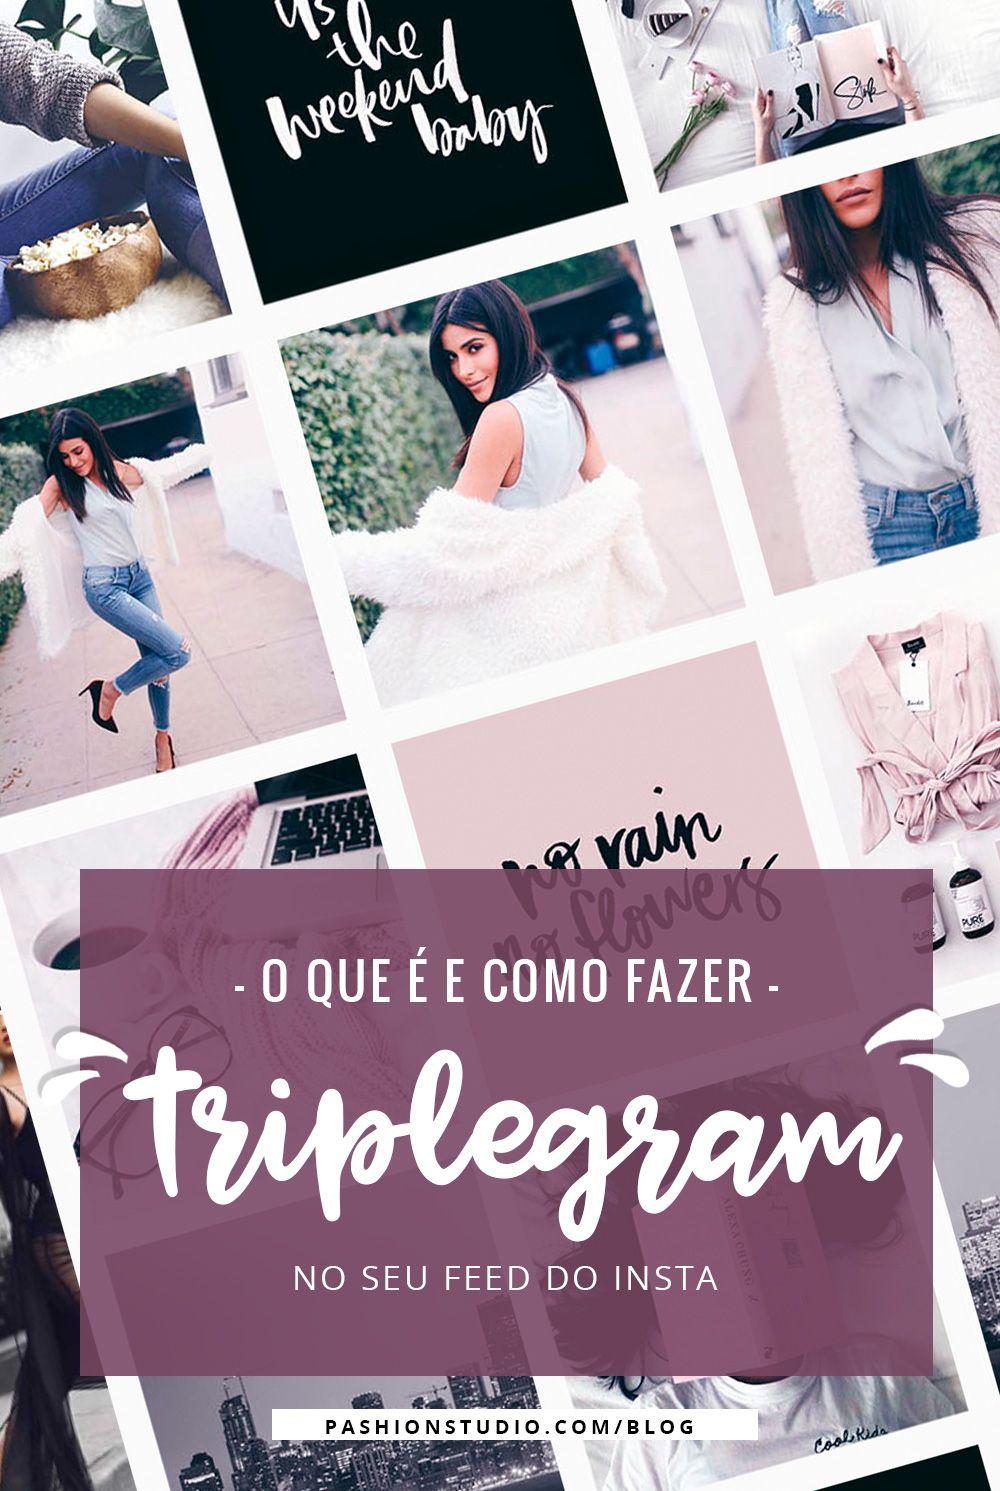 Pin Em Design Instagram Digital Marketing And More